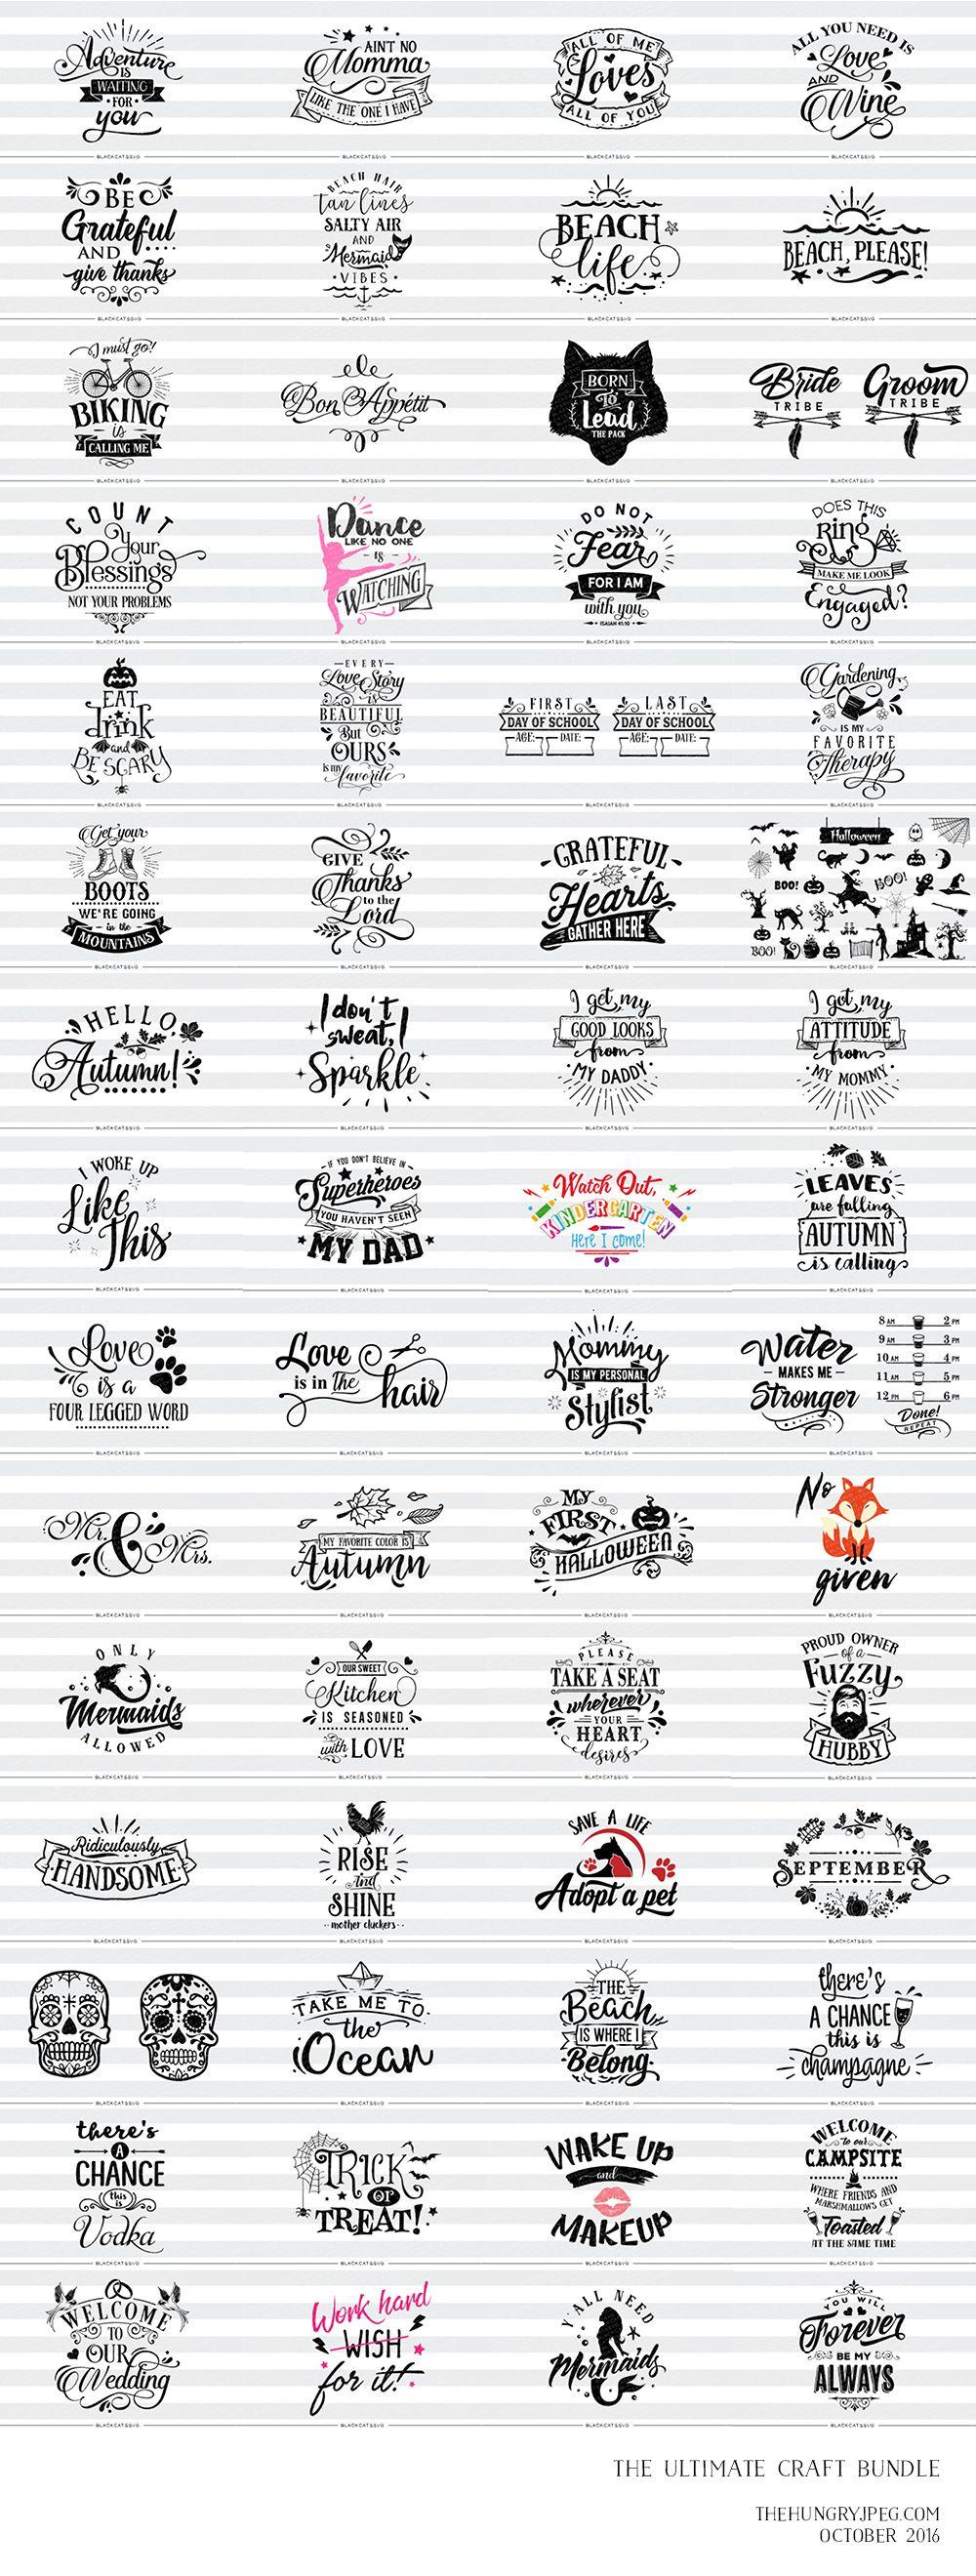 Pin by Jackie Schoenfeld-Babbitt on SVG Files | Silhouette, Cricut